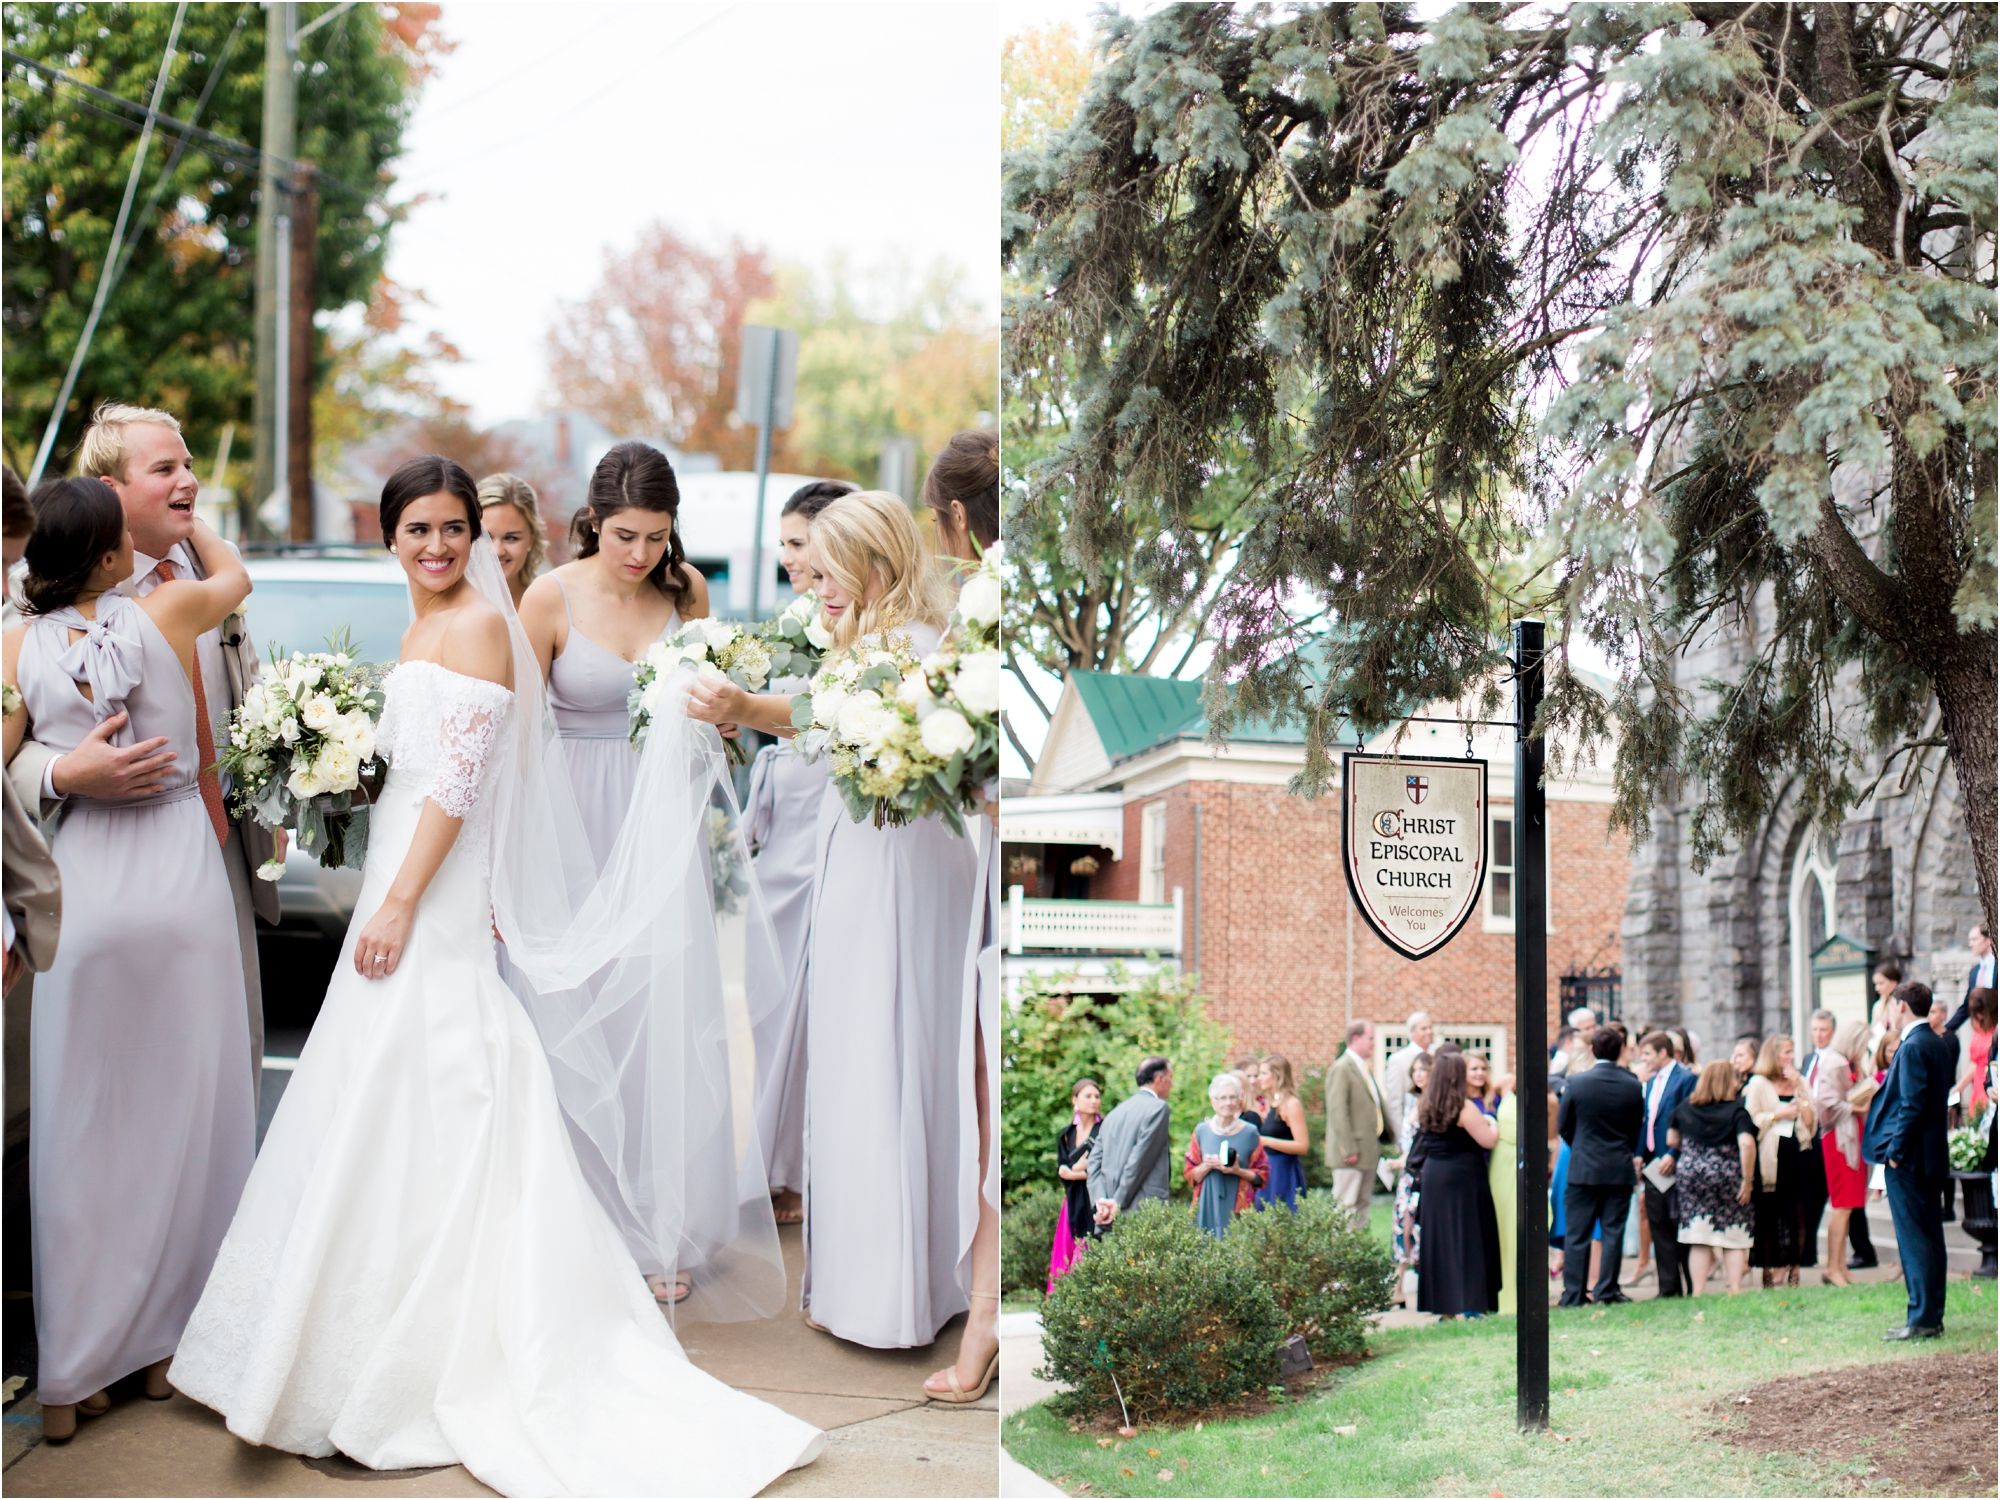 claire-thomas-farmington-country-club-charlottesville-virginia-wedding-photos_0029.jpg